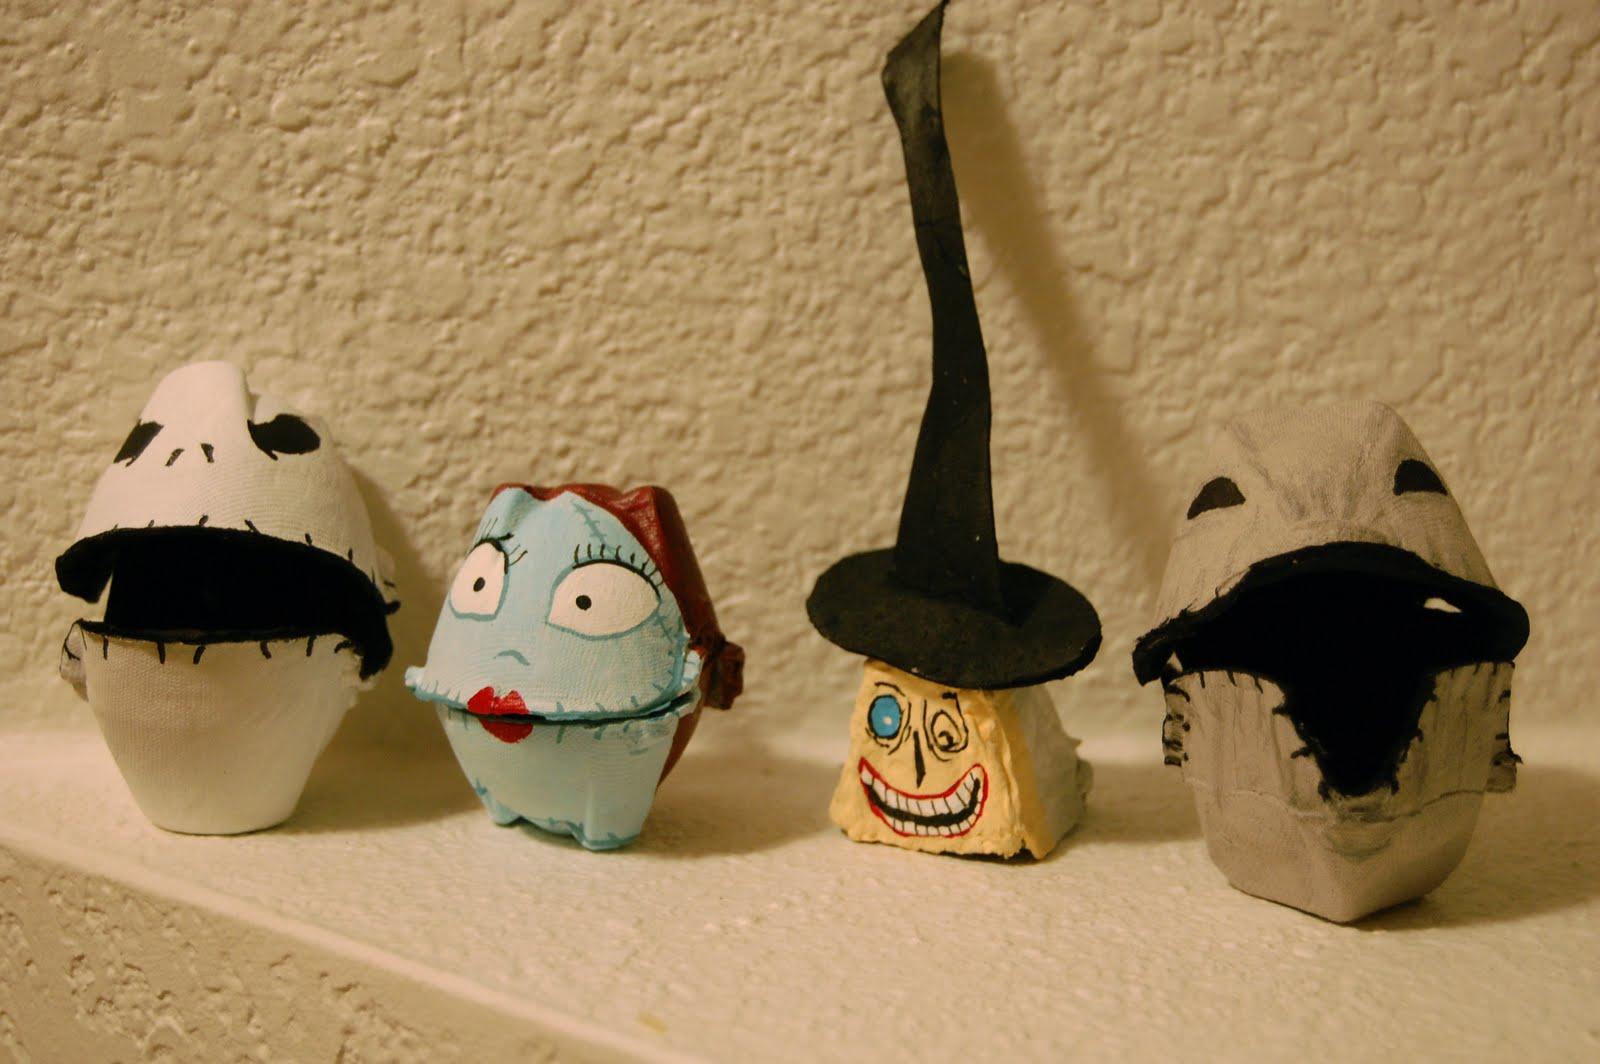 Bekannt Live Your Art: Egg Carton Creations QE85